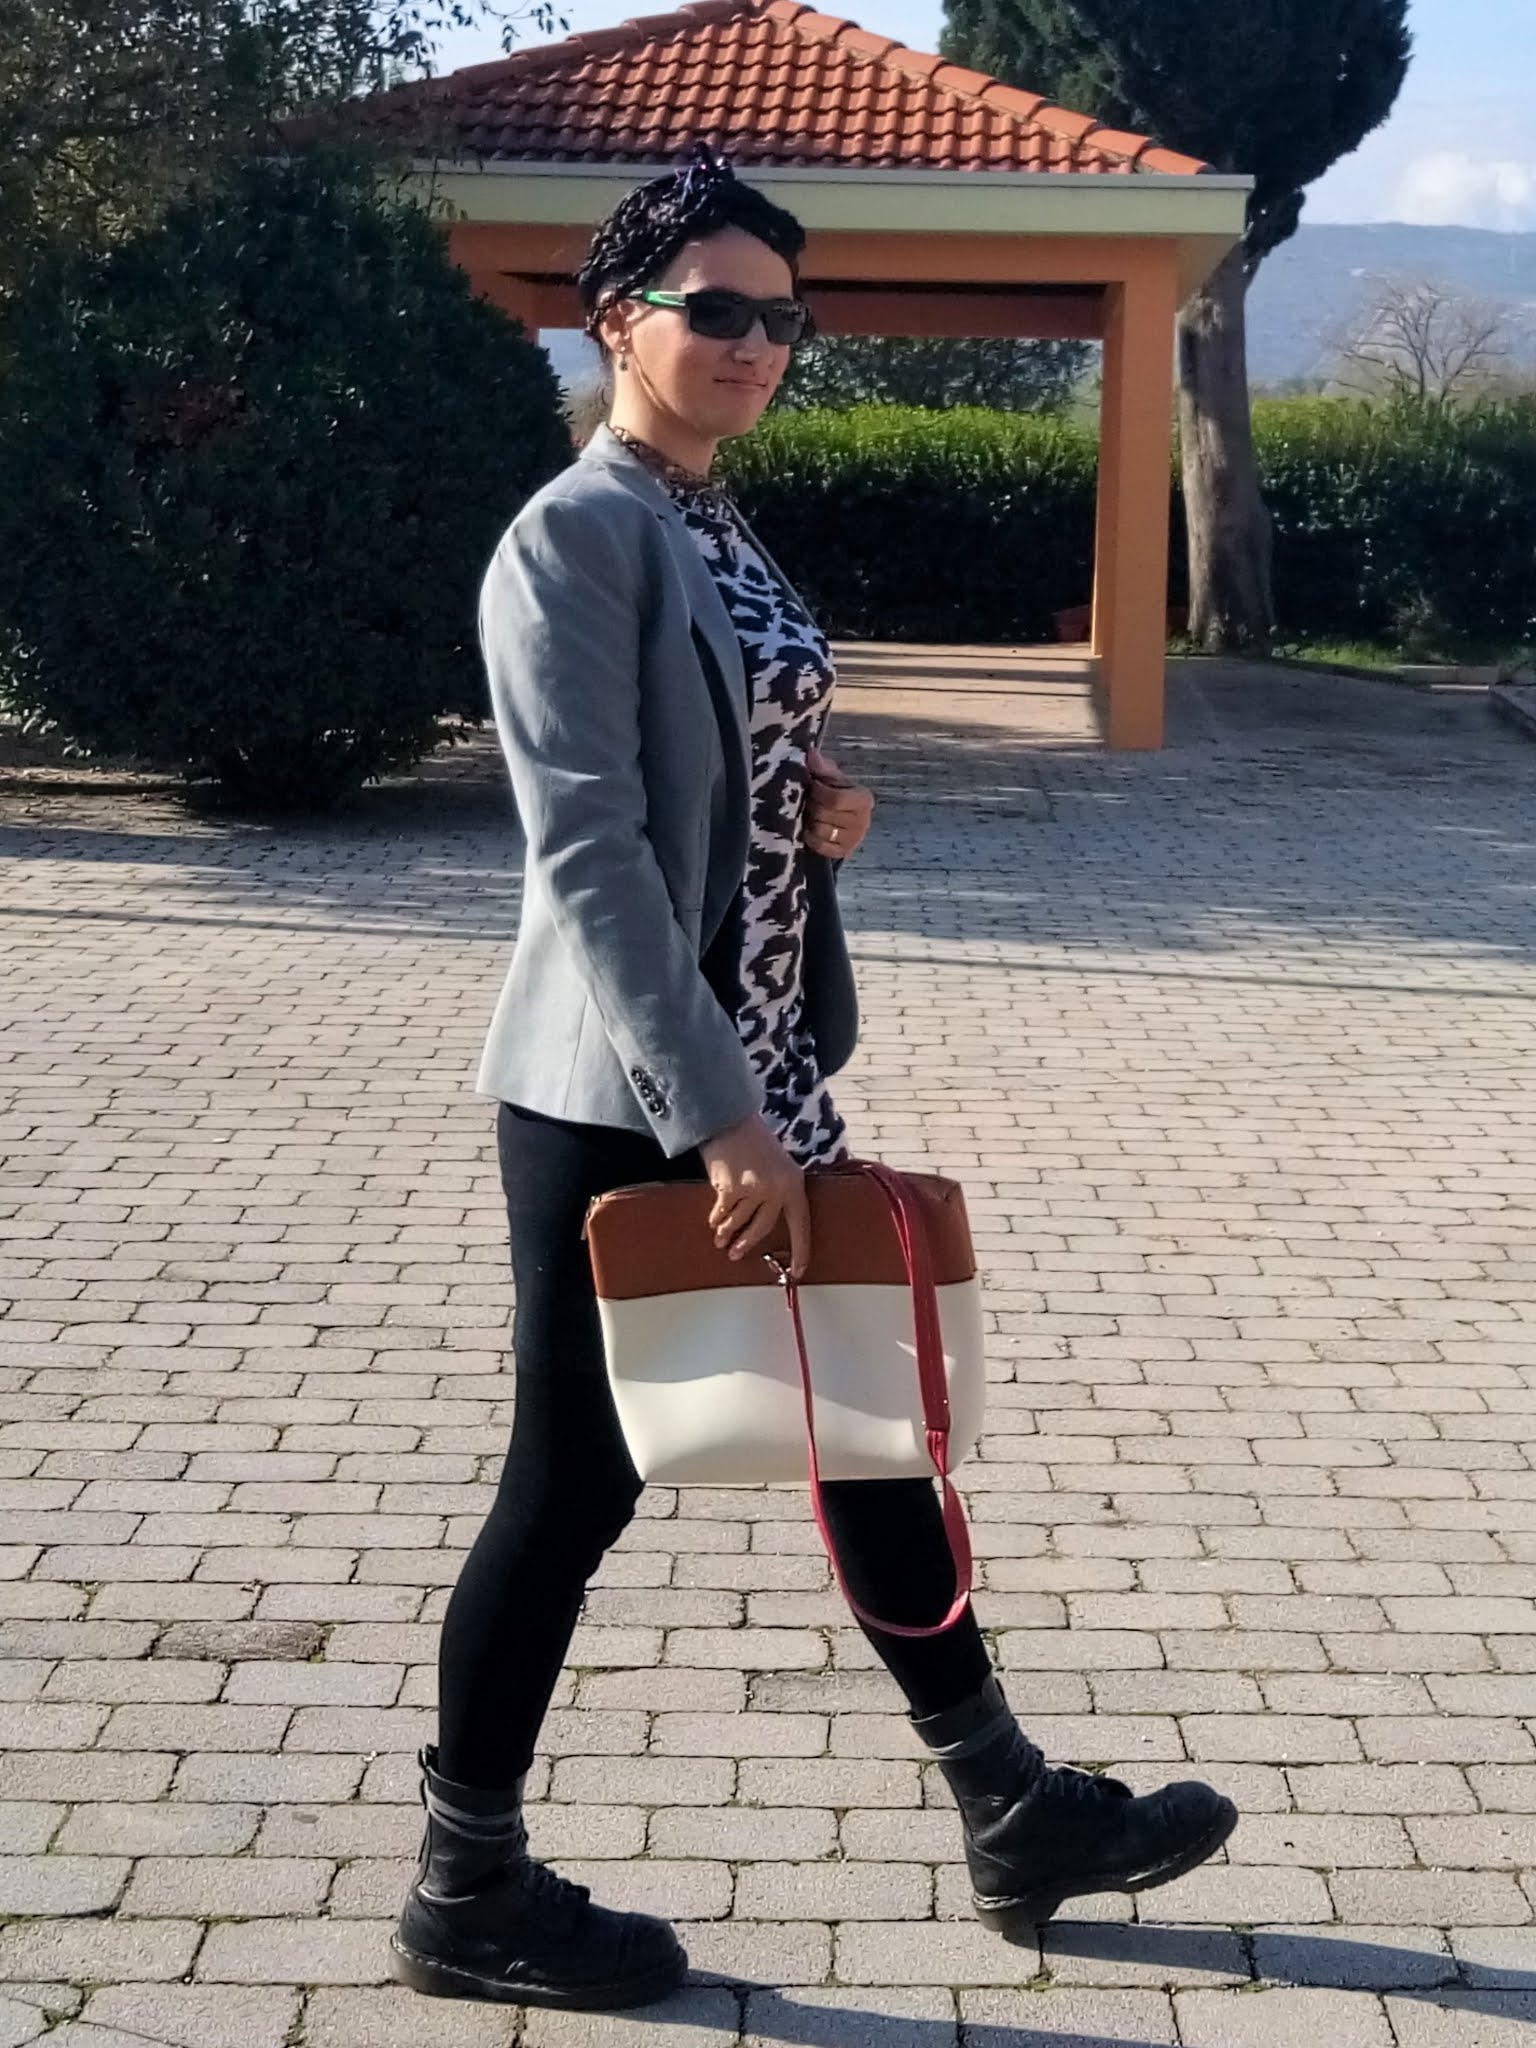 #modaodaradosti #docmartens #dress #autumn #fashionblog